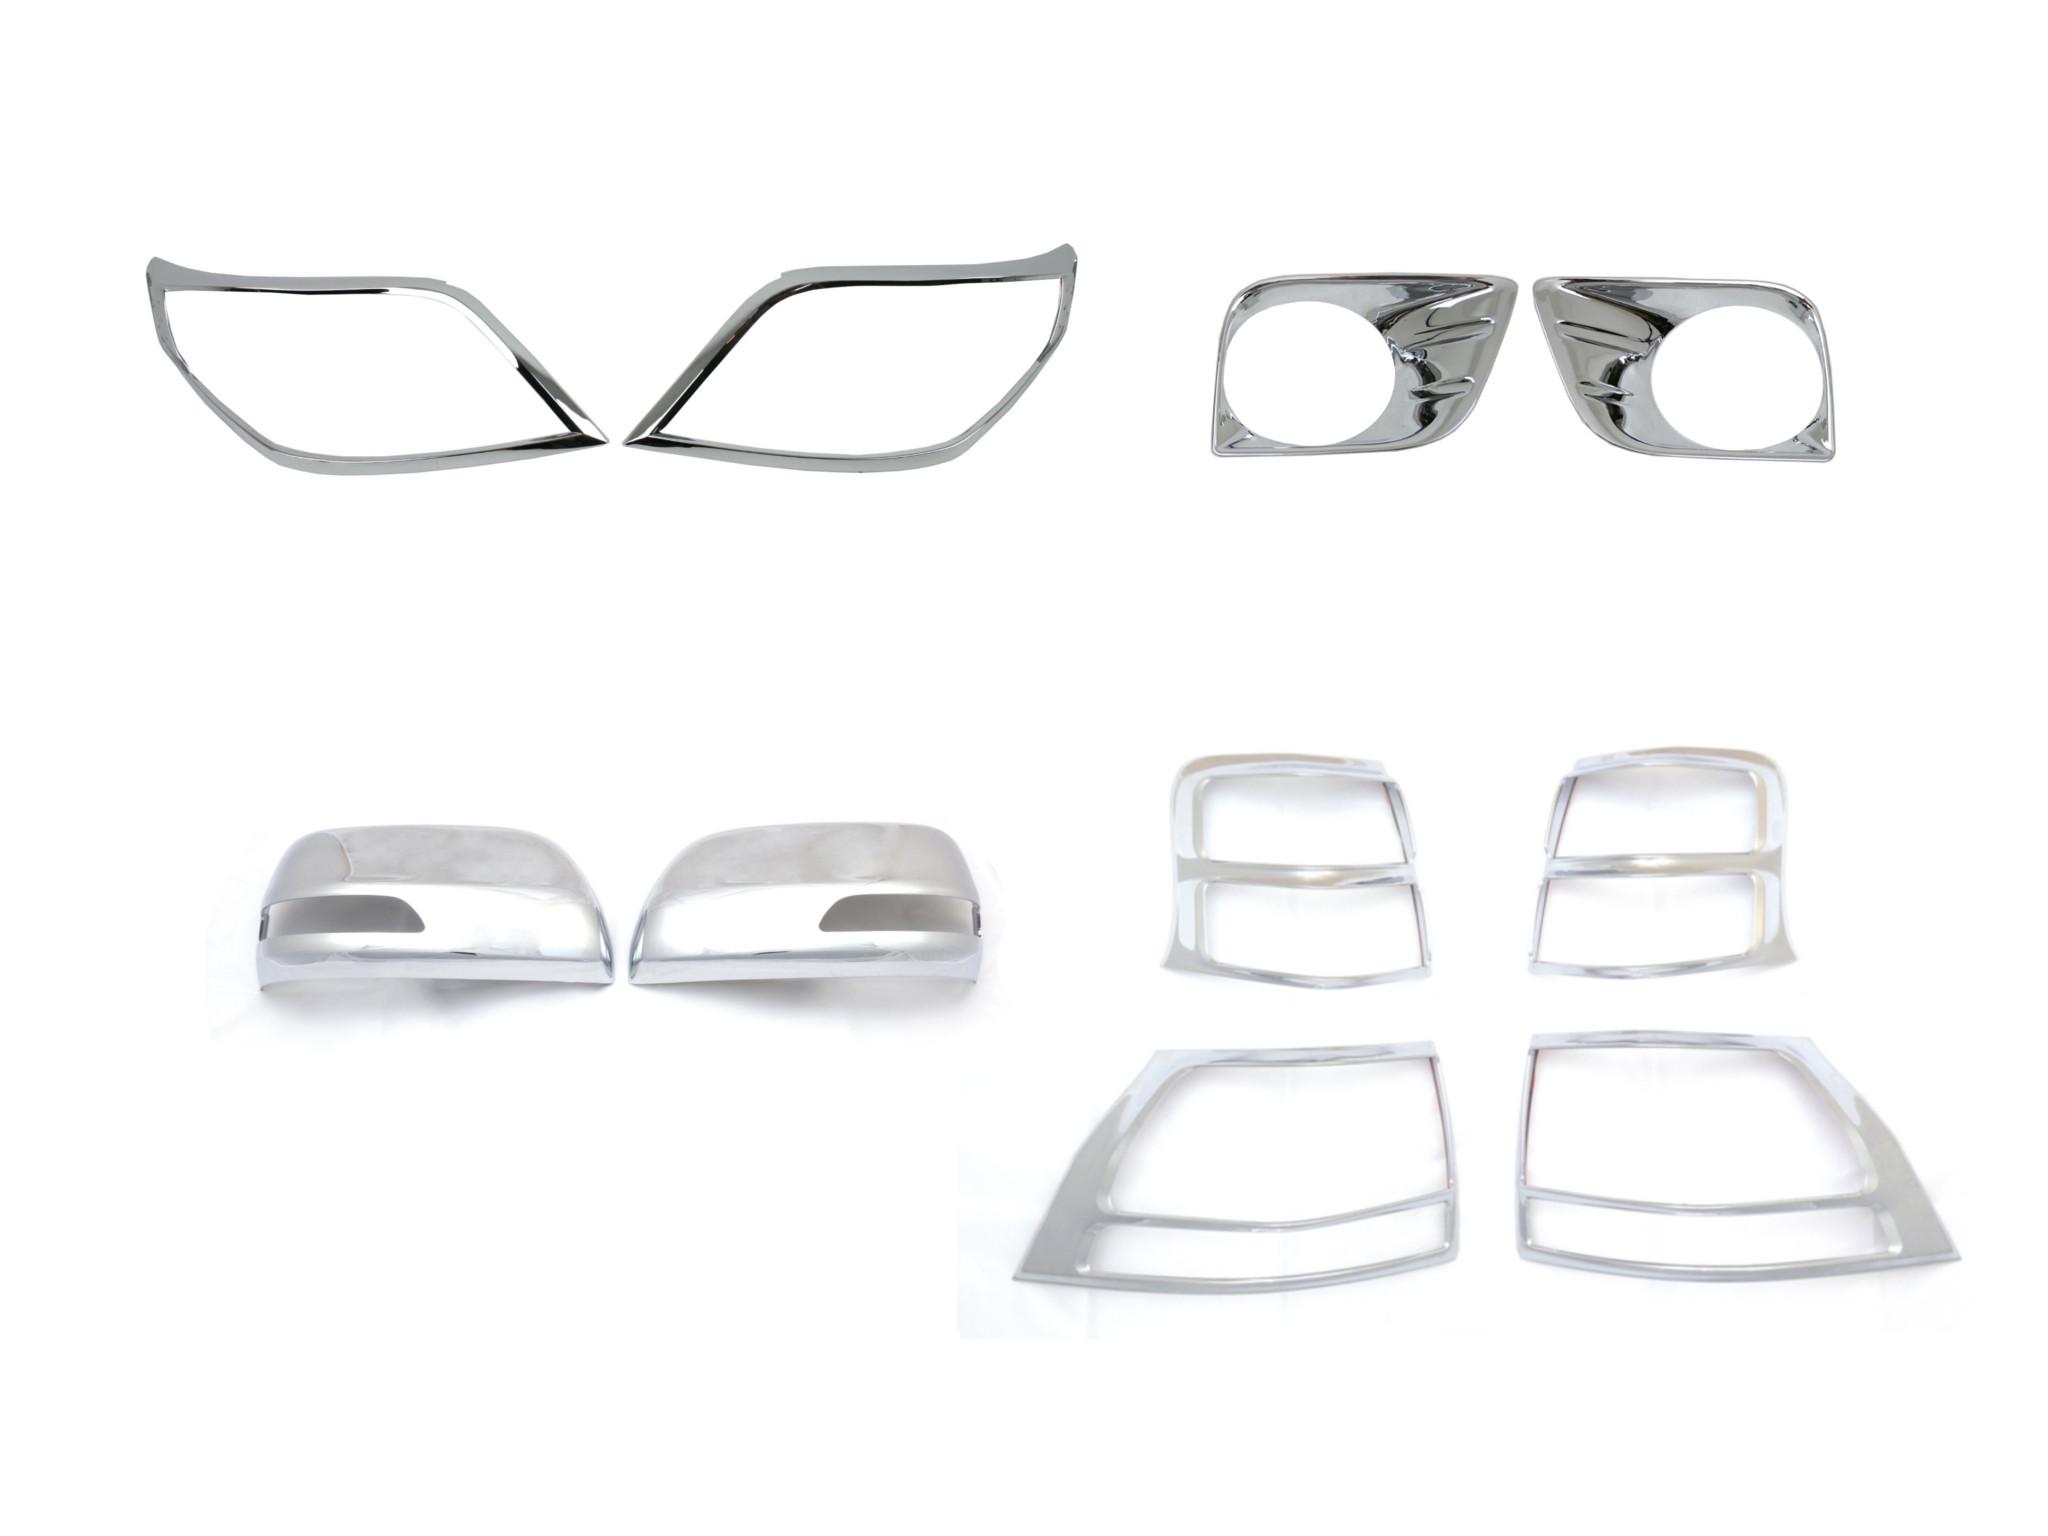 Complete Chromed Abs Plastic Trim Set For Toyota Land